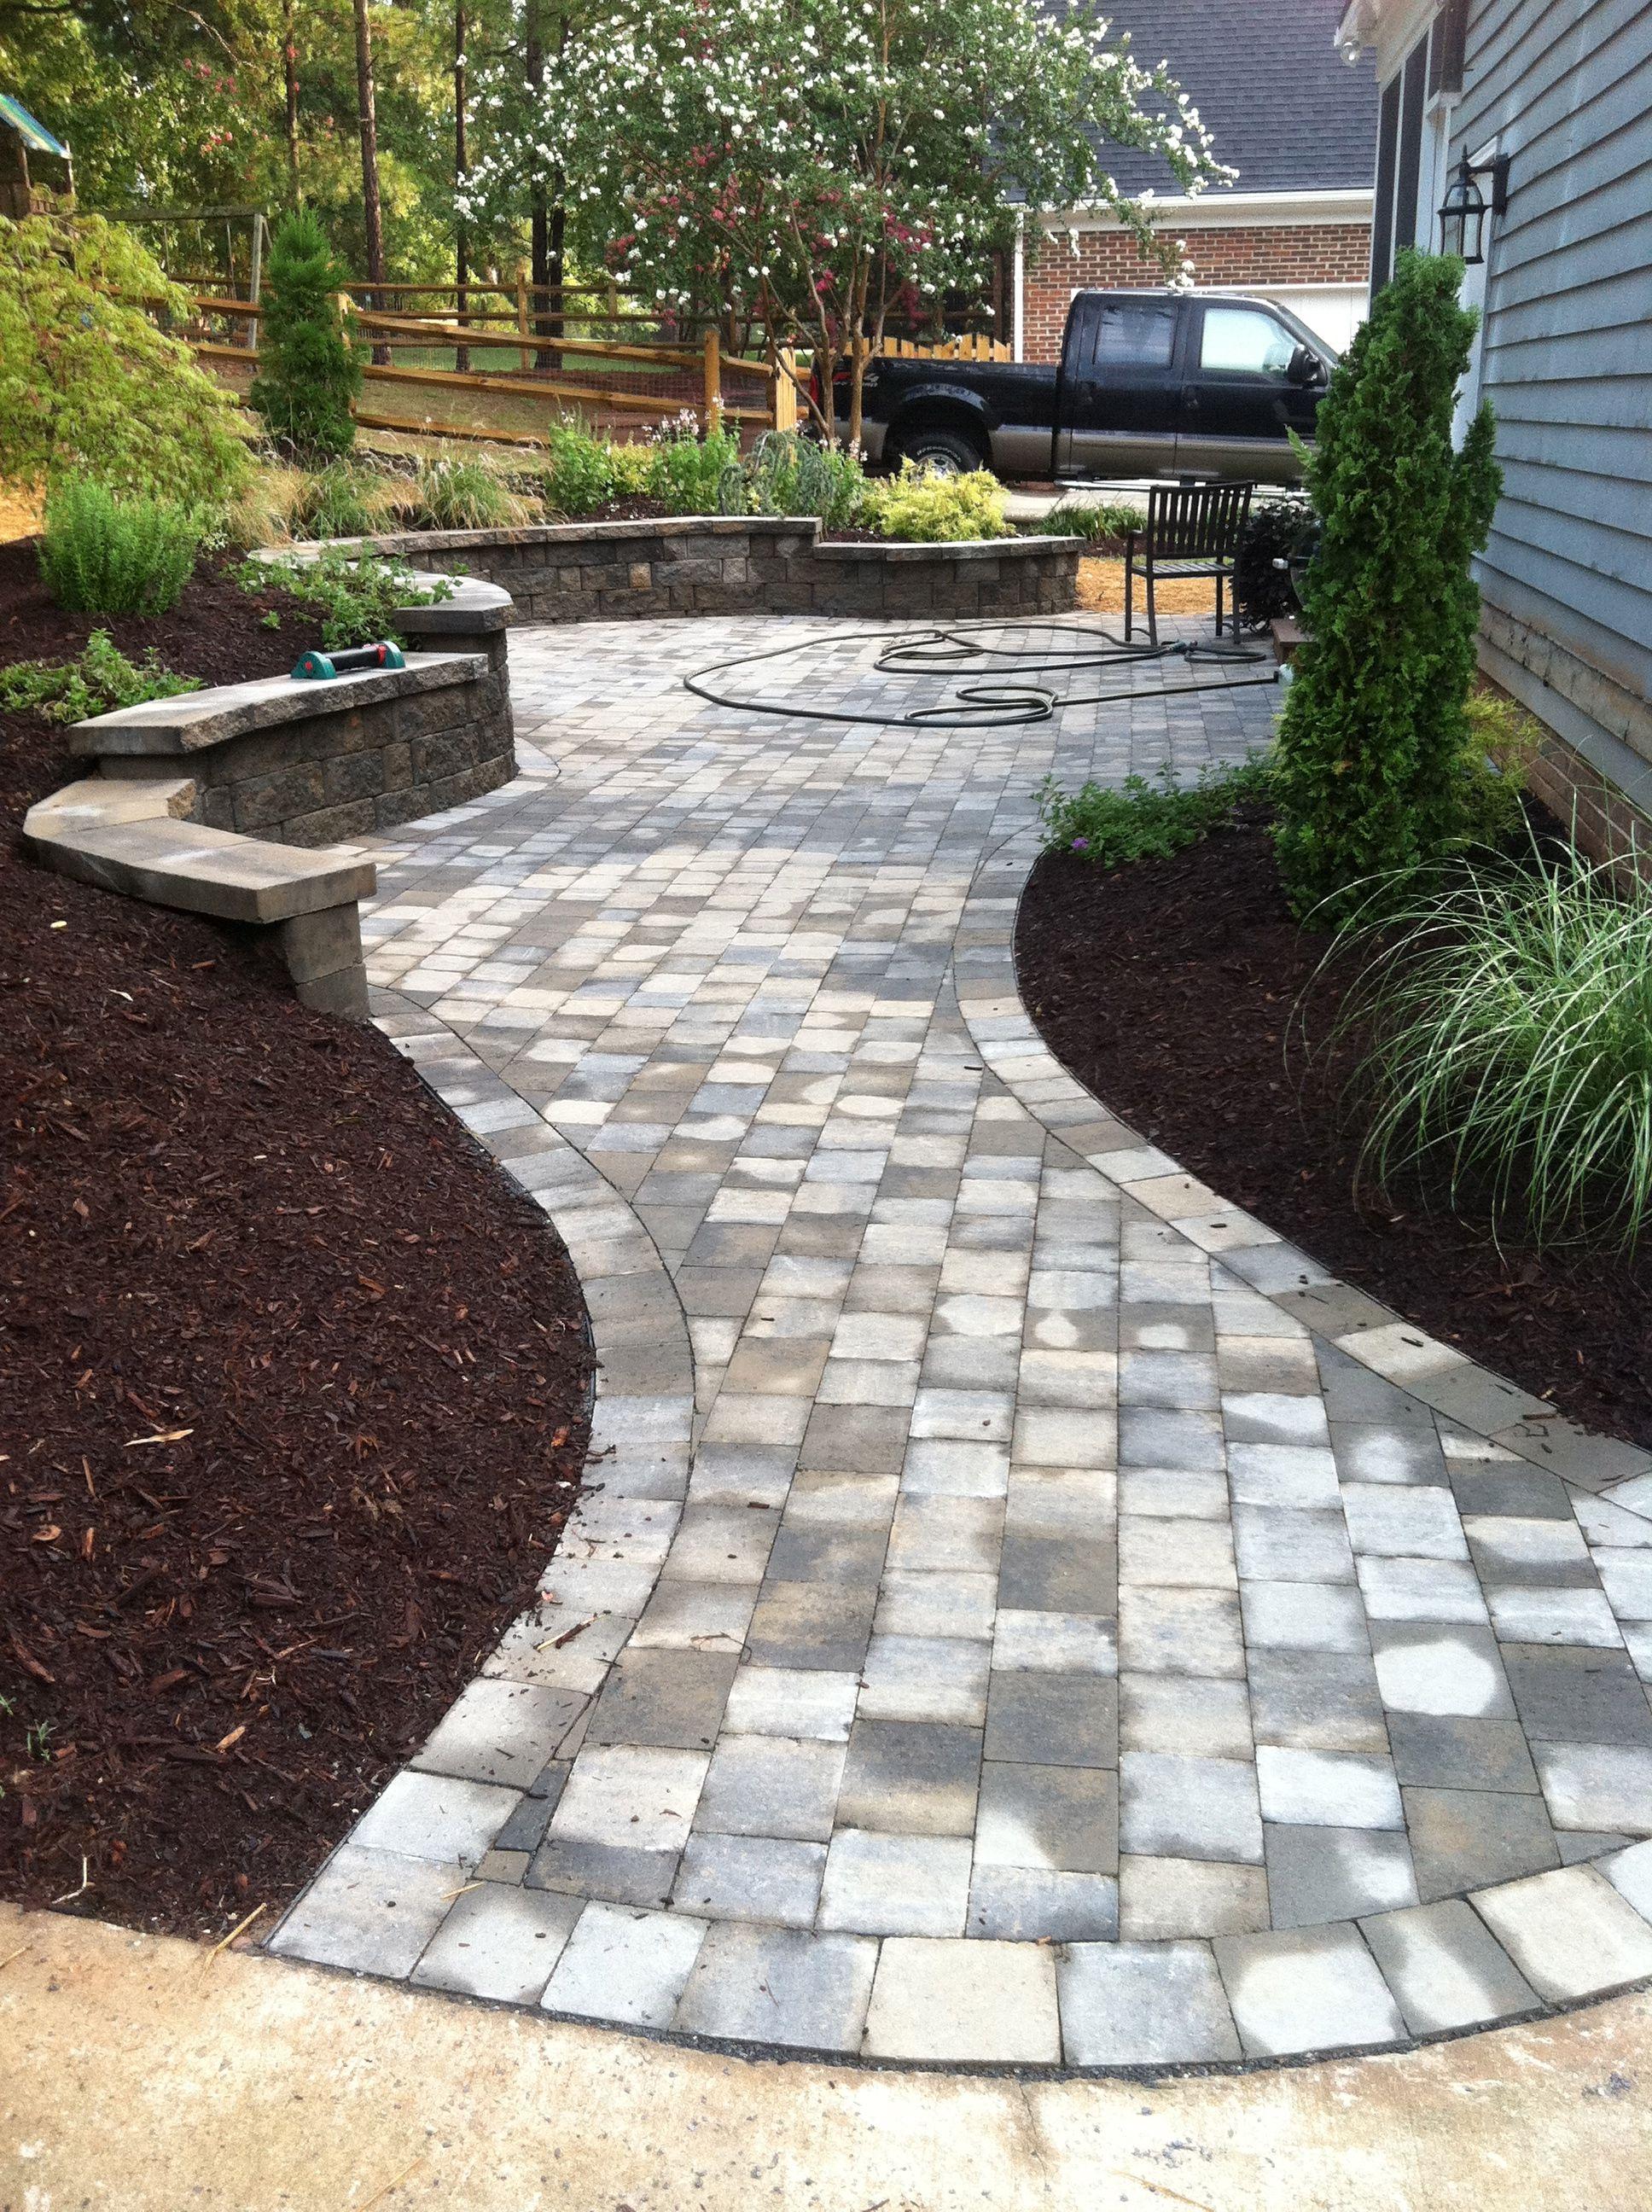 walkway paver patio designs walkway designs and patio designs | Paver Patio/Walkway